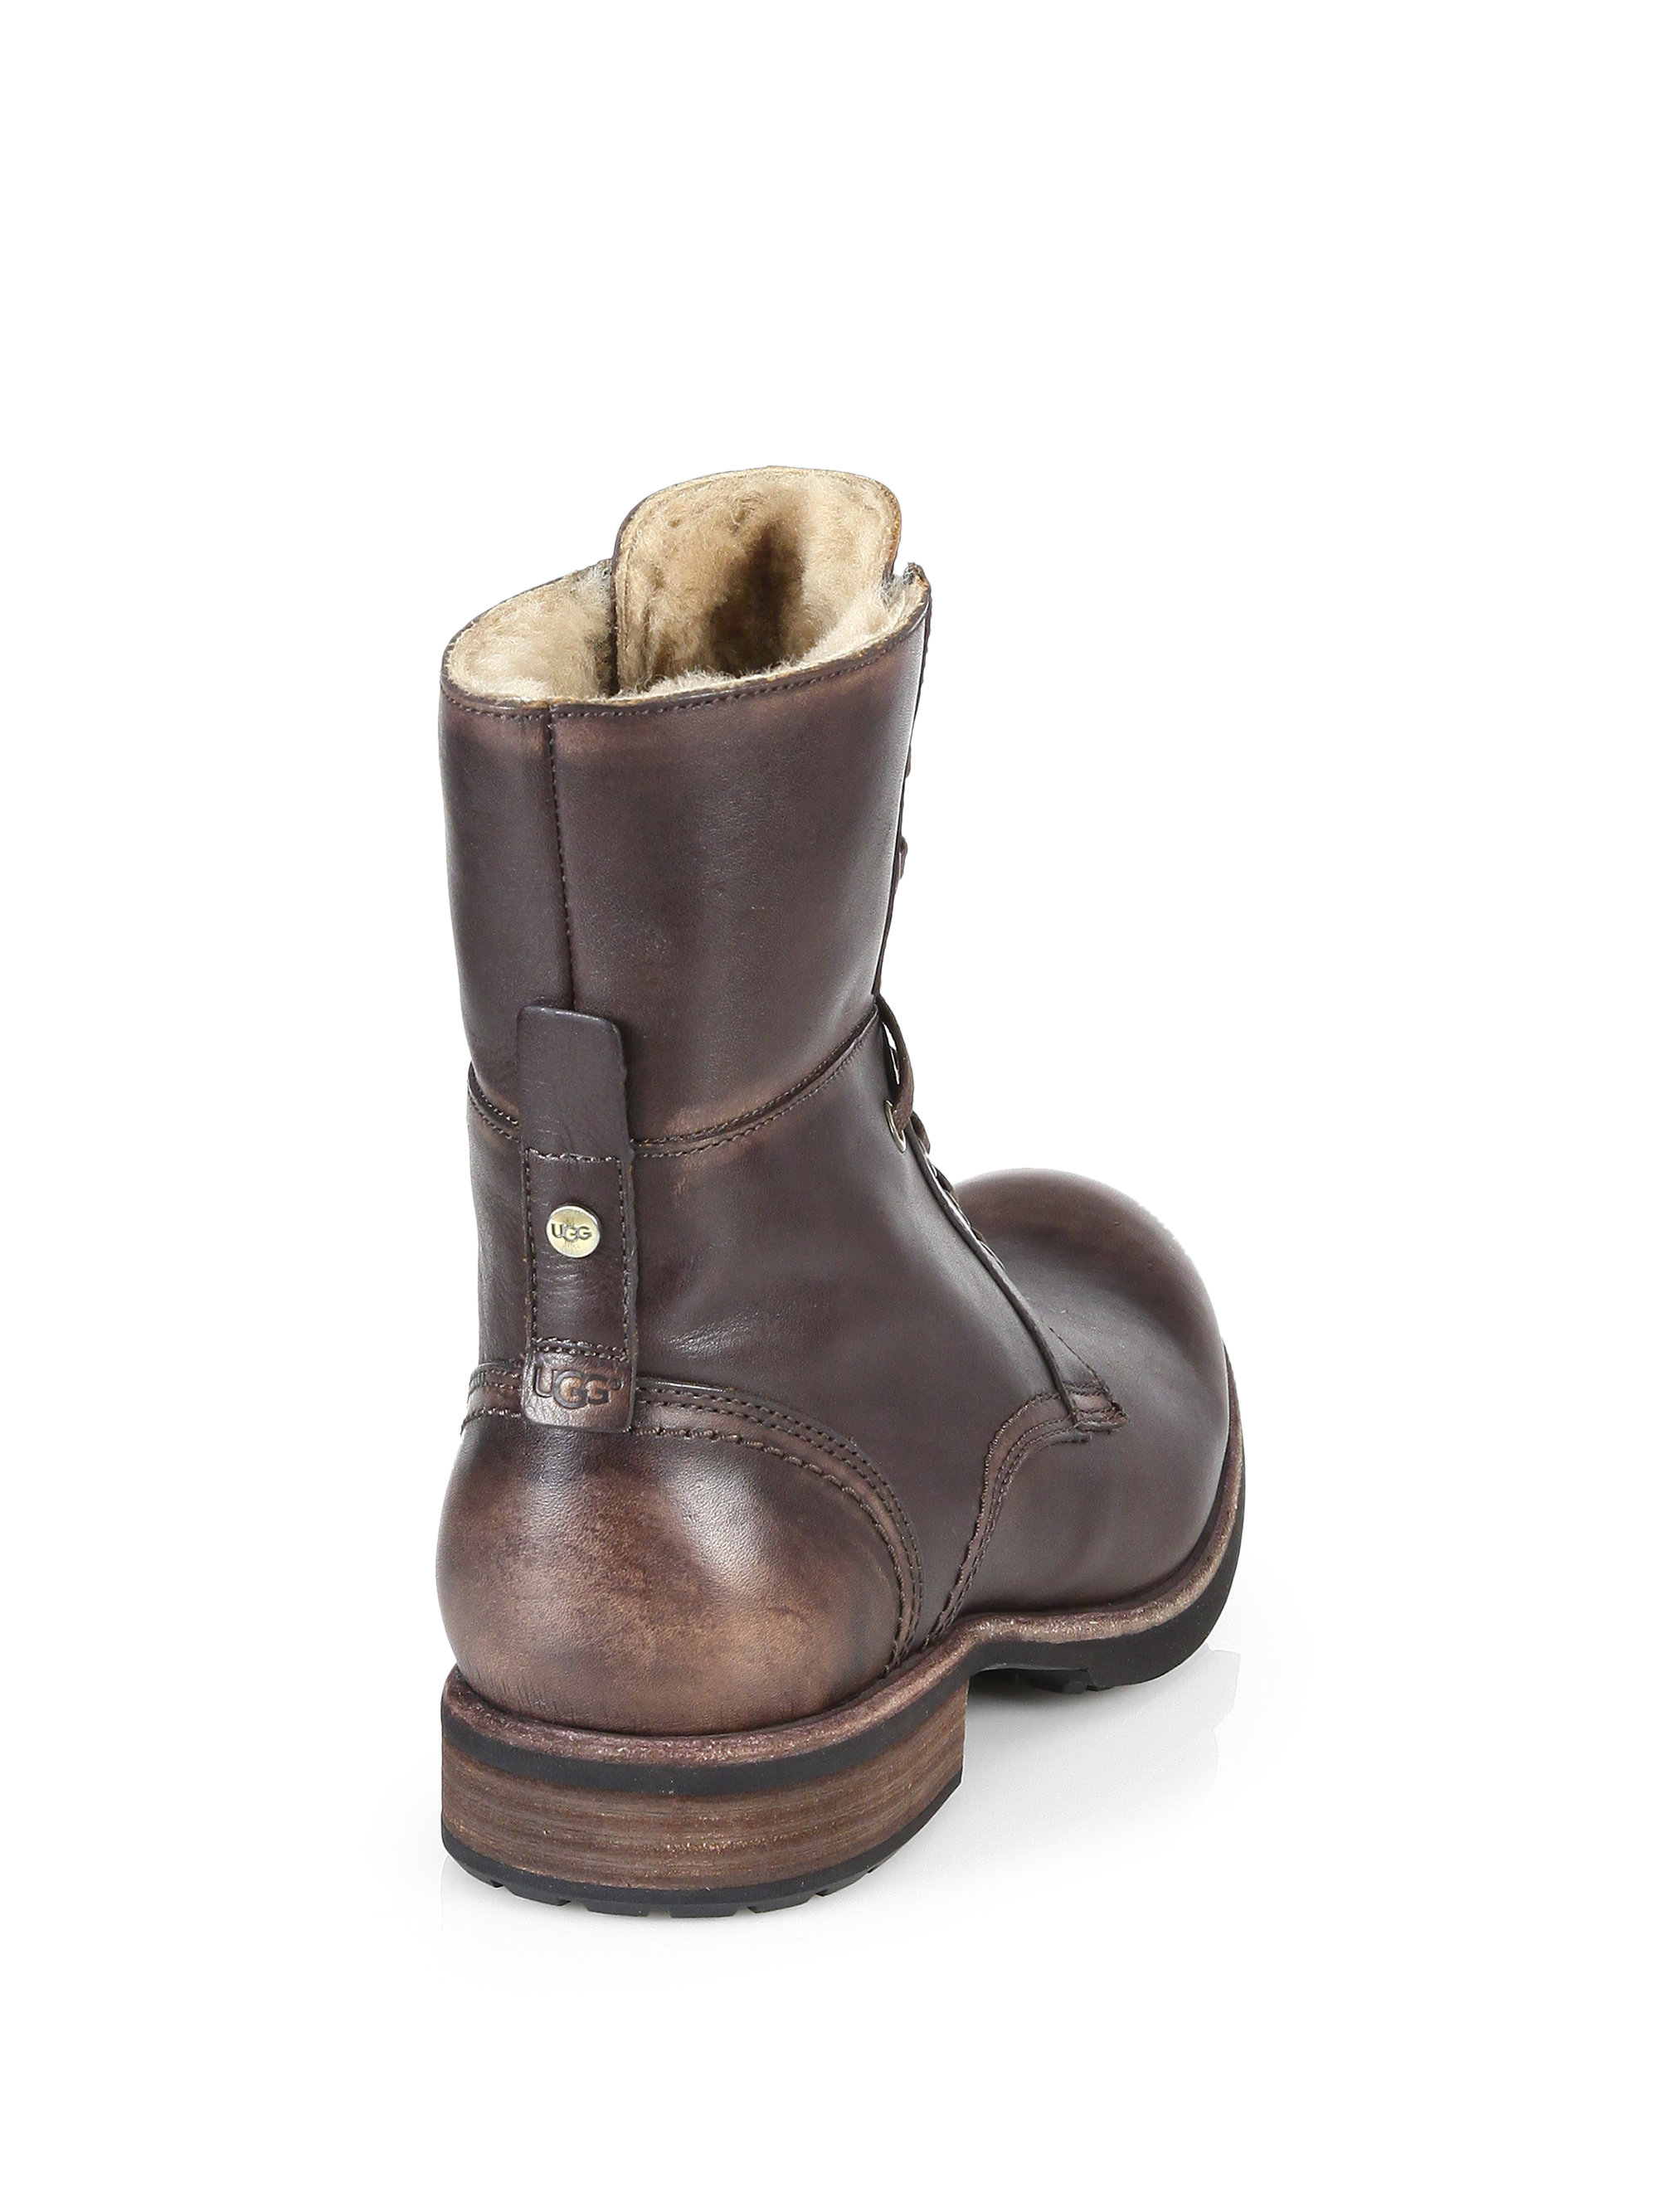 ugg josette boots chestnut